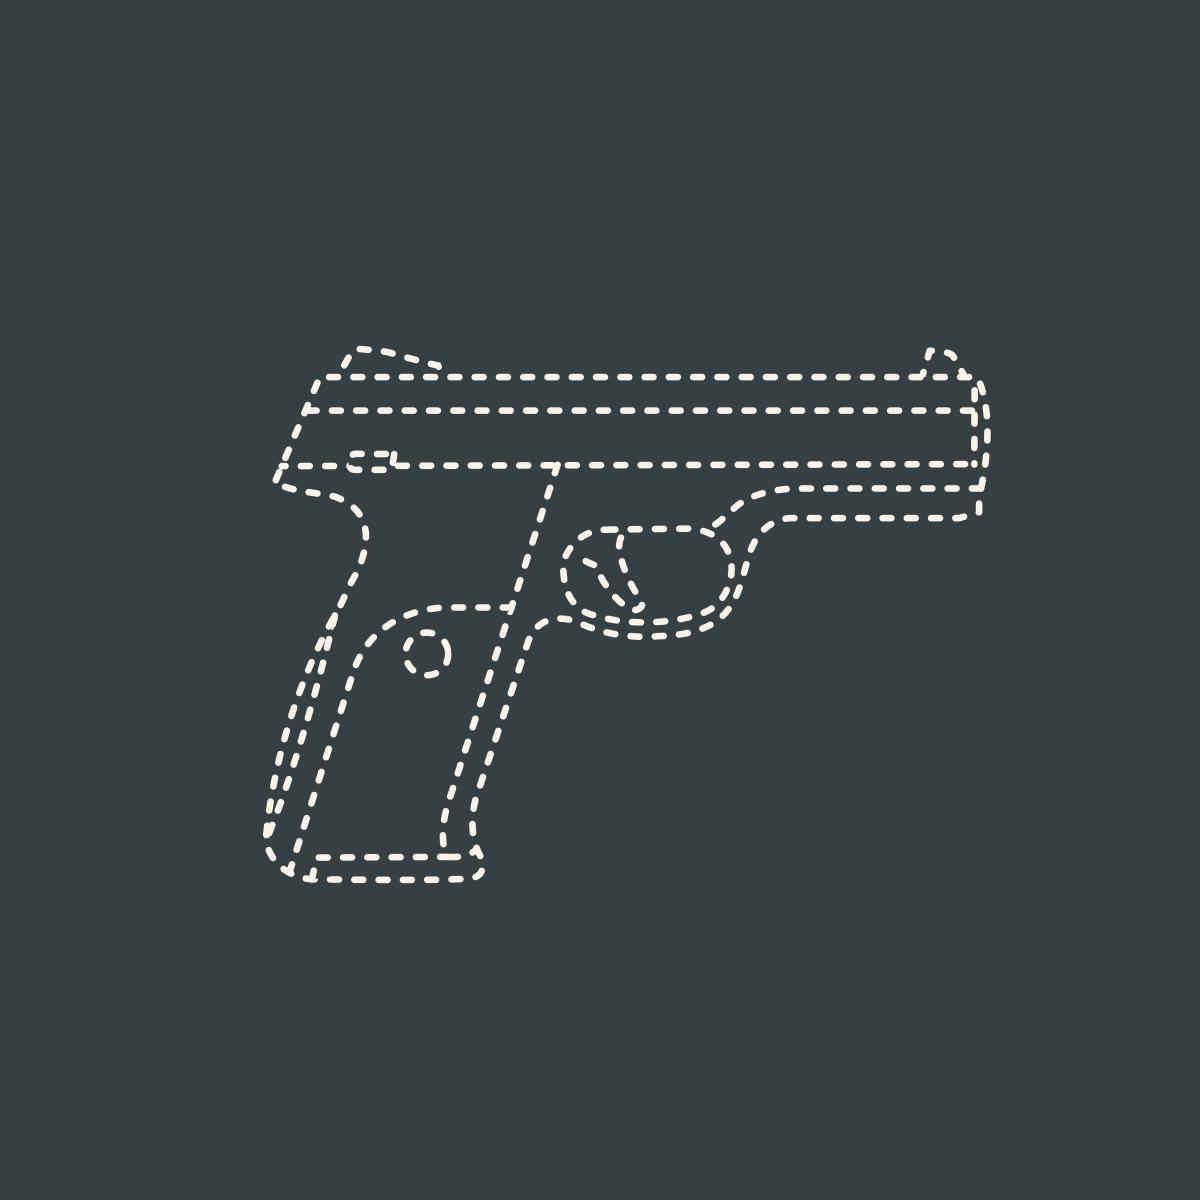 73 gun control